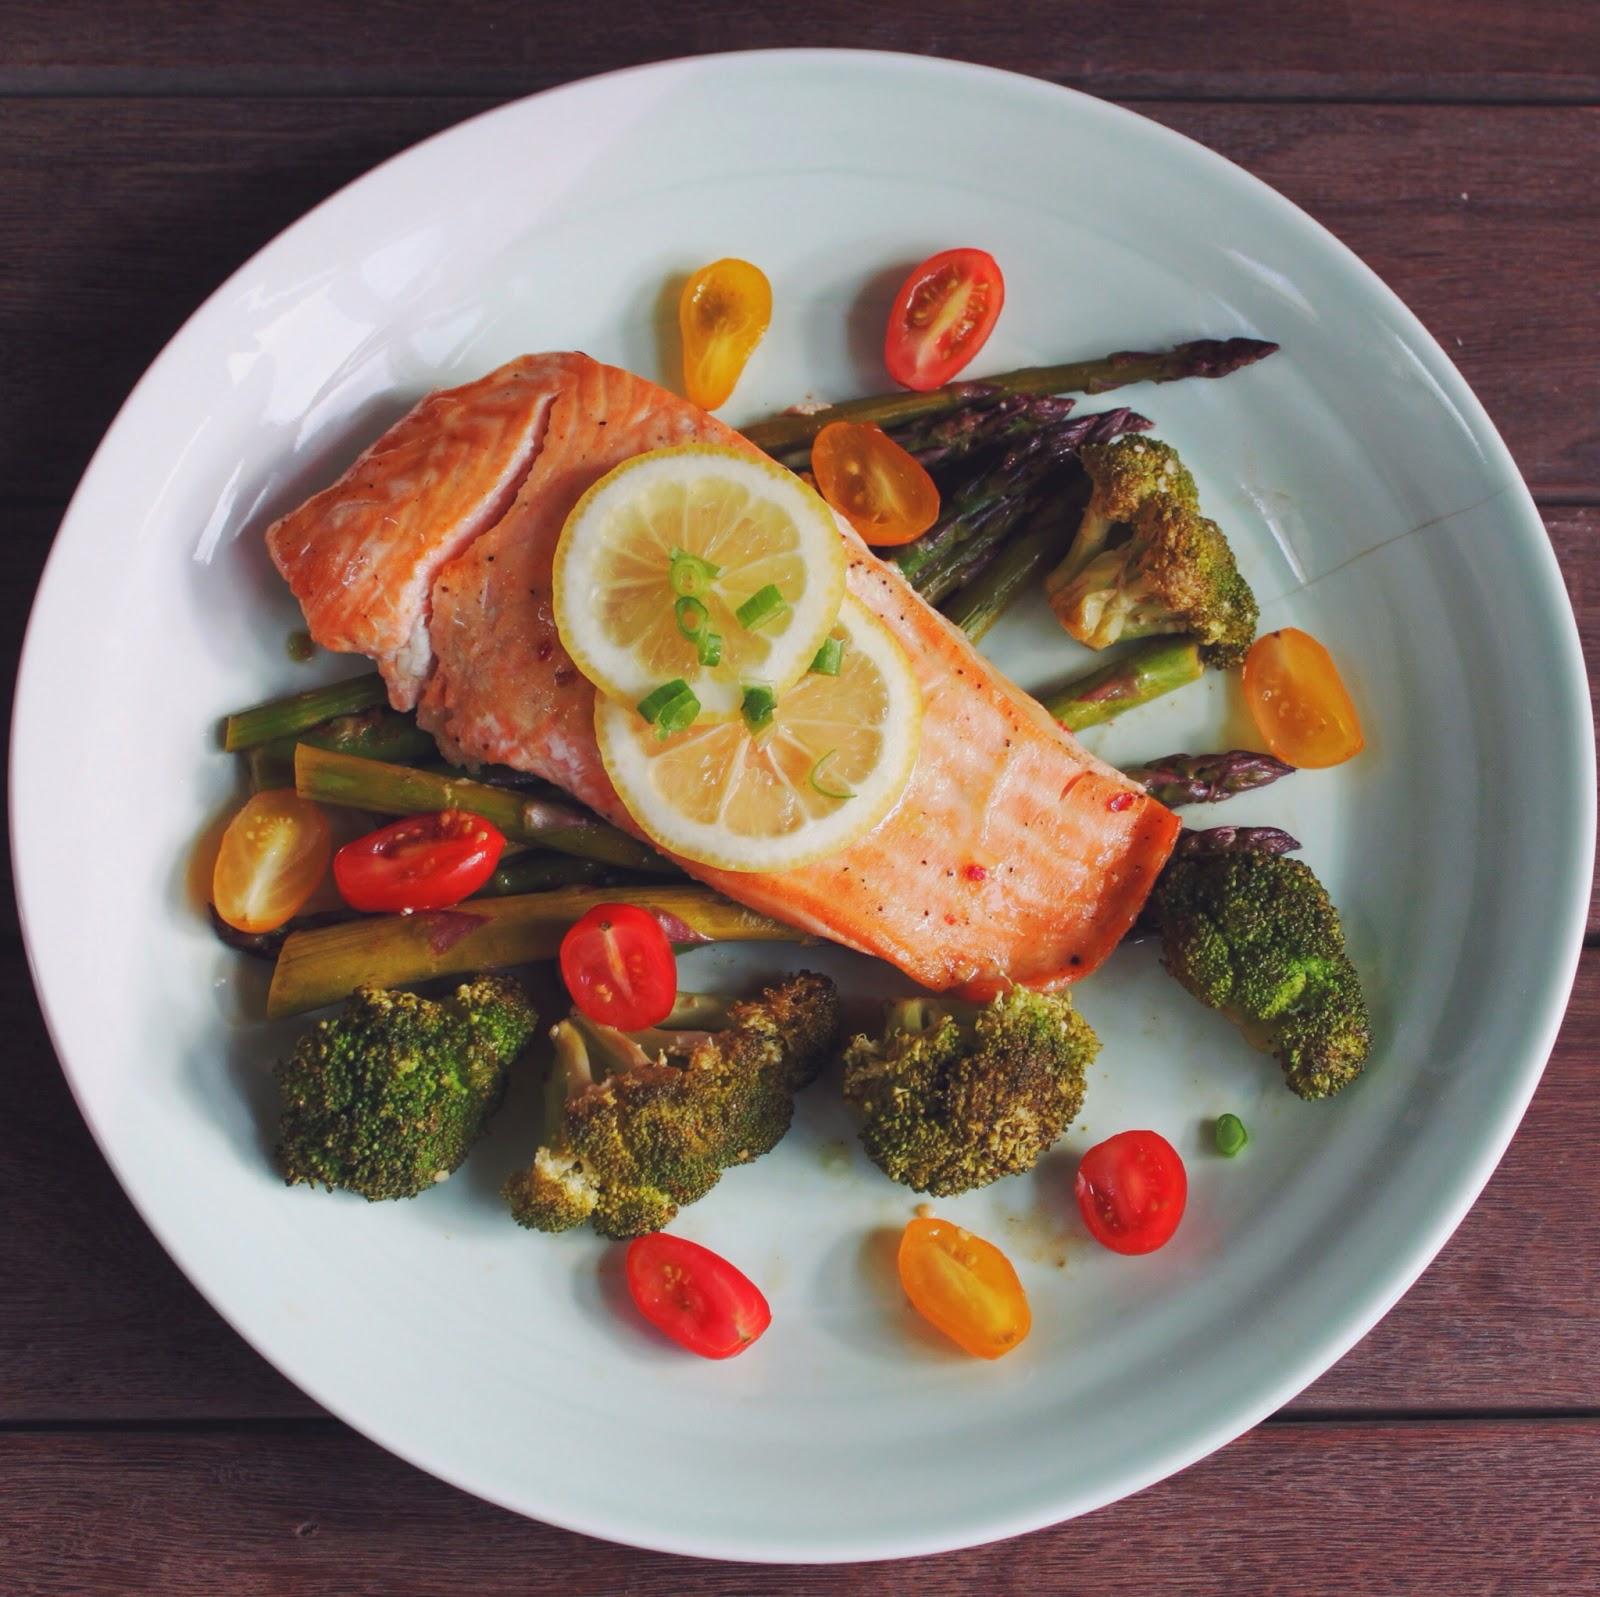 One-Pan Baked Salmon and Veggies - Gypsy Tan